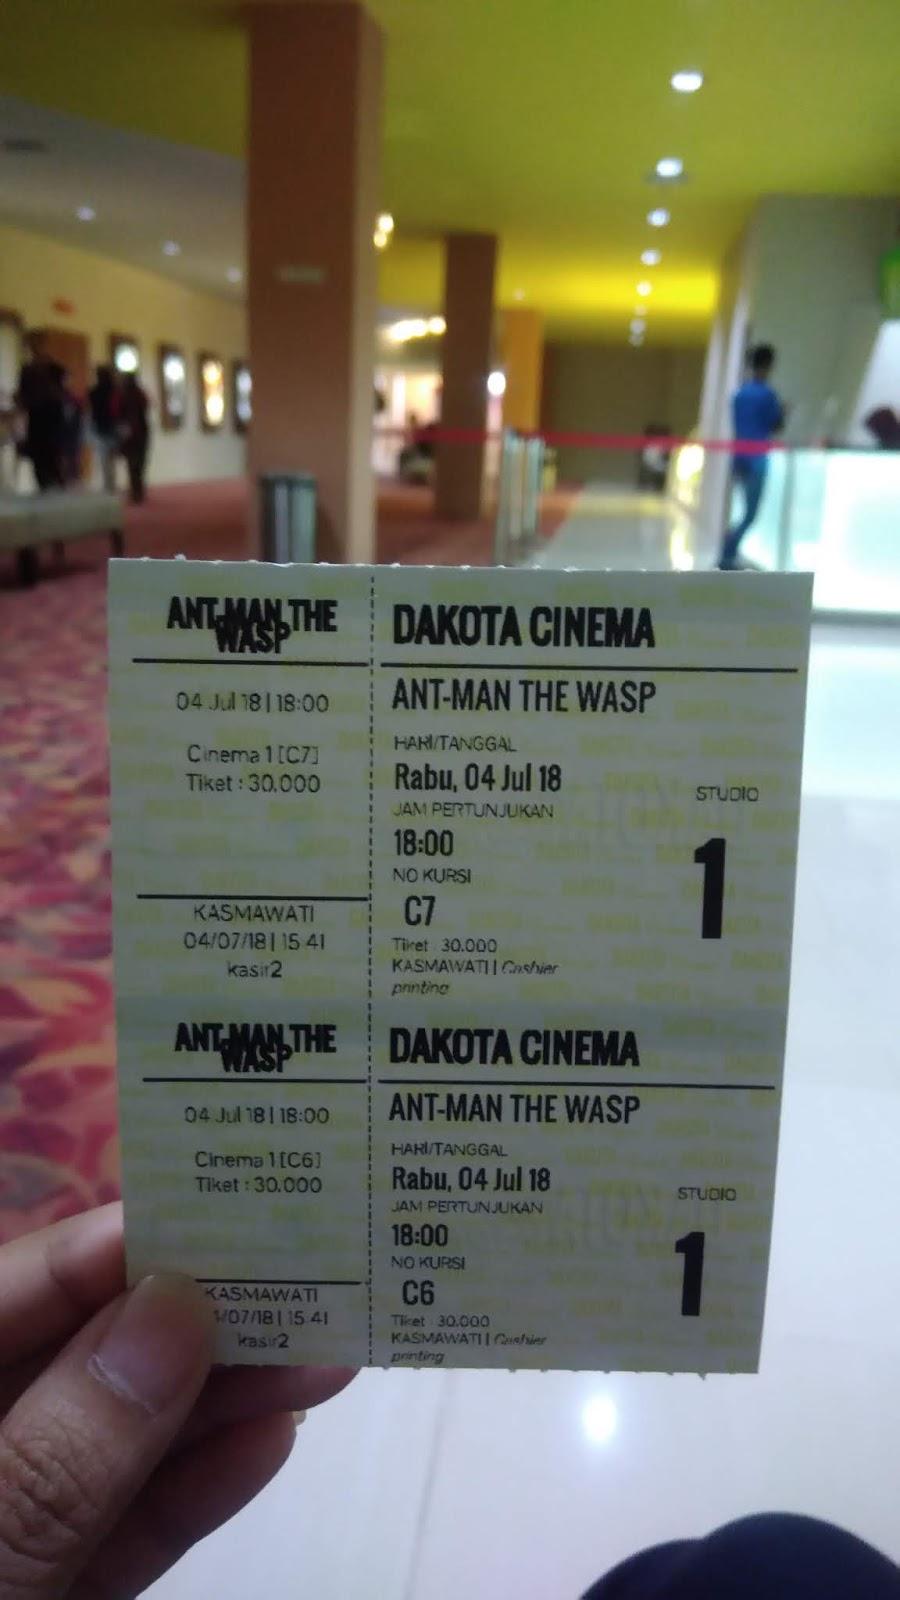 Jadwal Blitz Cirebon : jadwal, blitz, cirebon, Gambar, Tiket, Bioskop